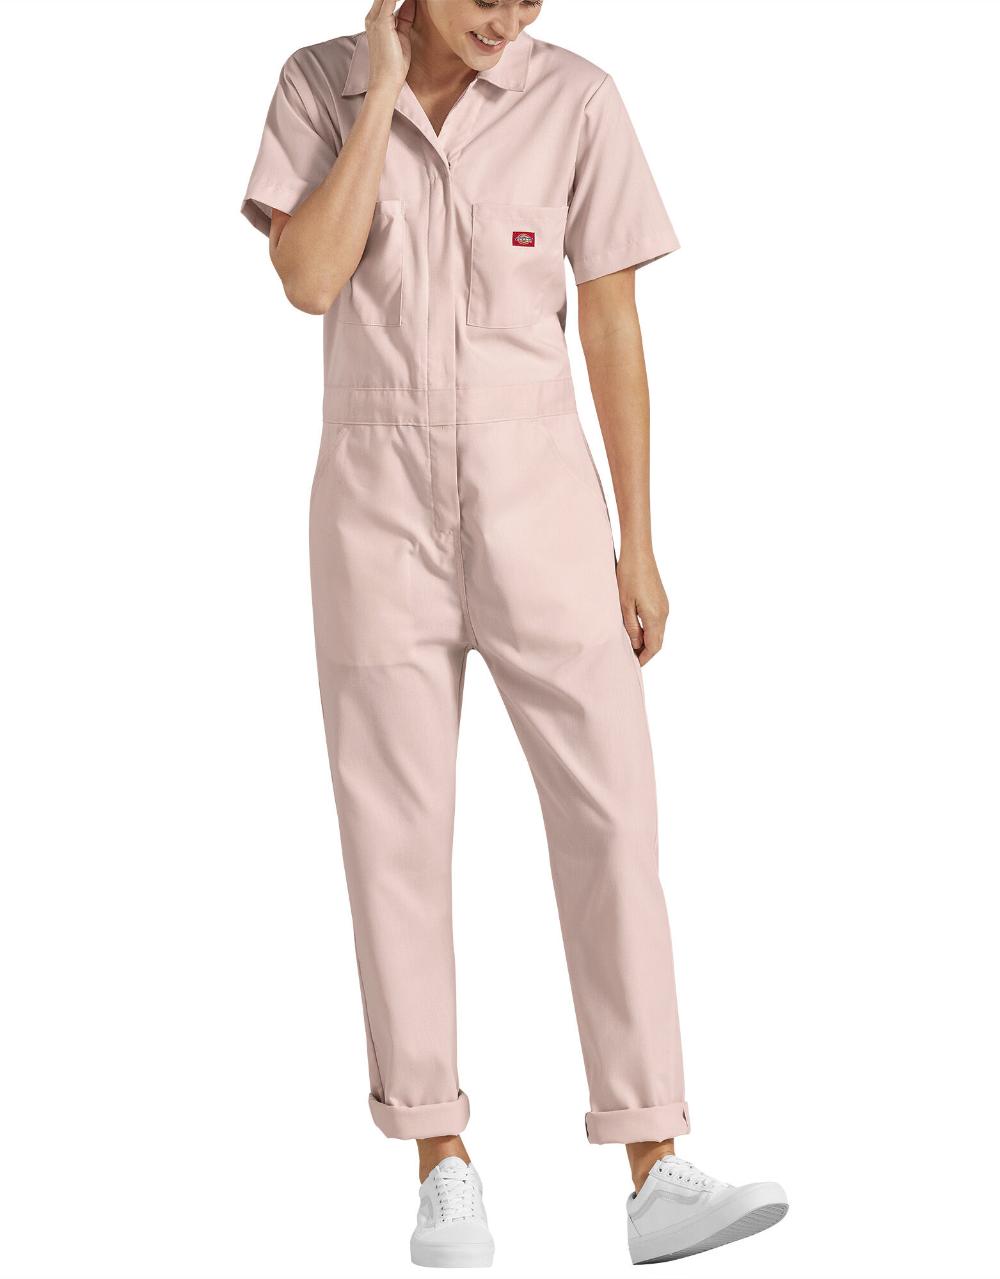 women s flex temp iq short sleeve coveralls dickies us on dickies coveralls id=27058